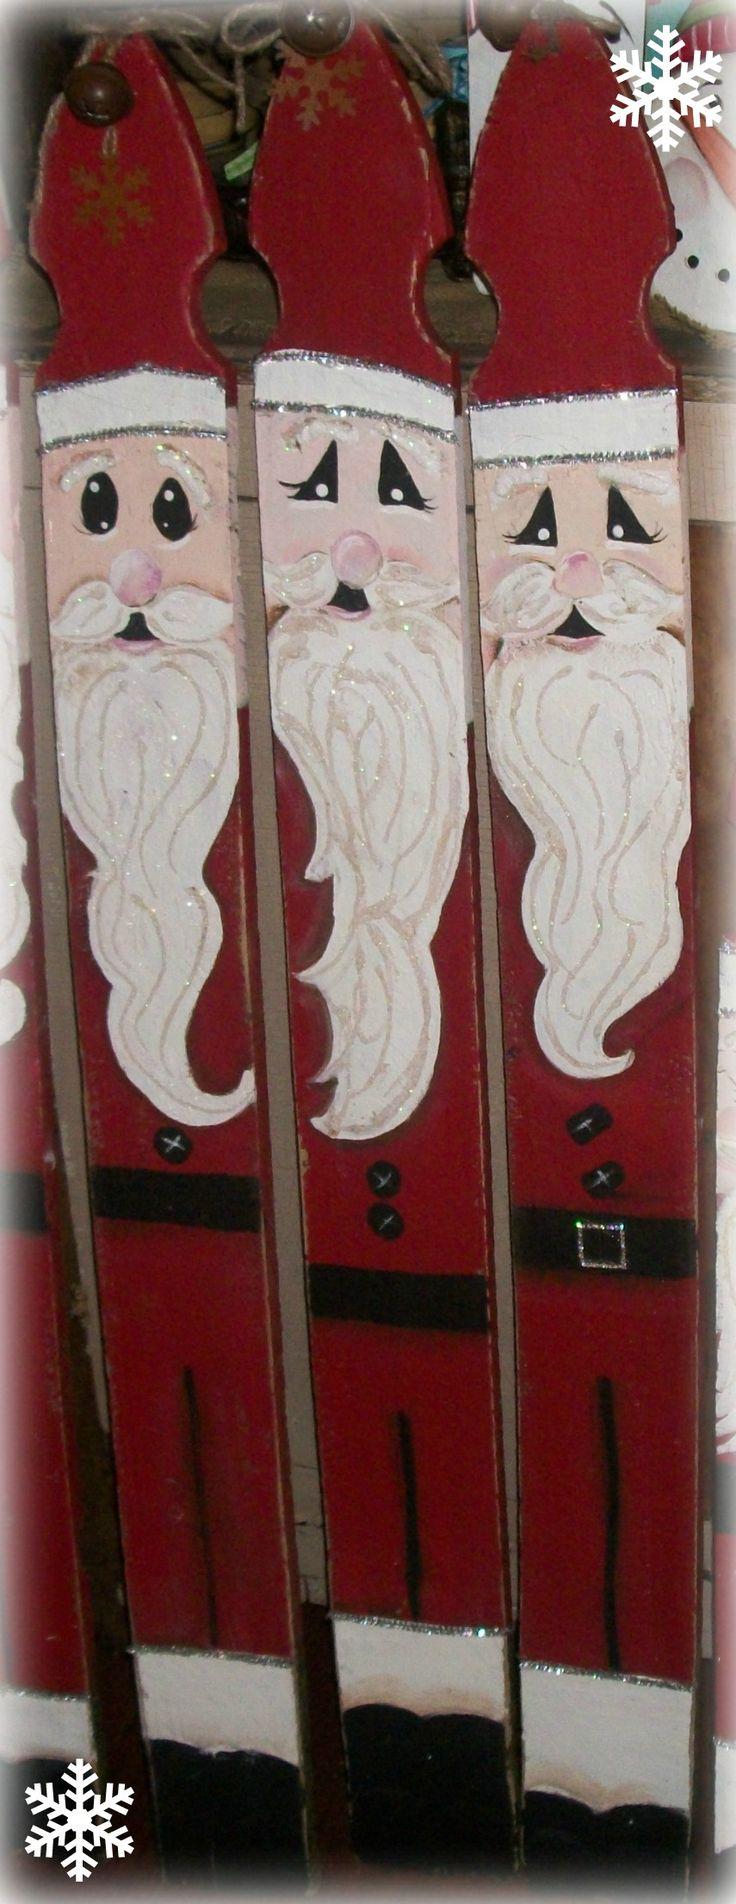 hand painted picket fence Santa Claus https://www.etsy.com/listing/210124932/santa-sign-paintingsanta-decorchristmas?ref=shop_home_active_12